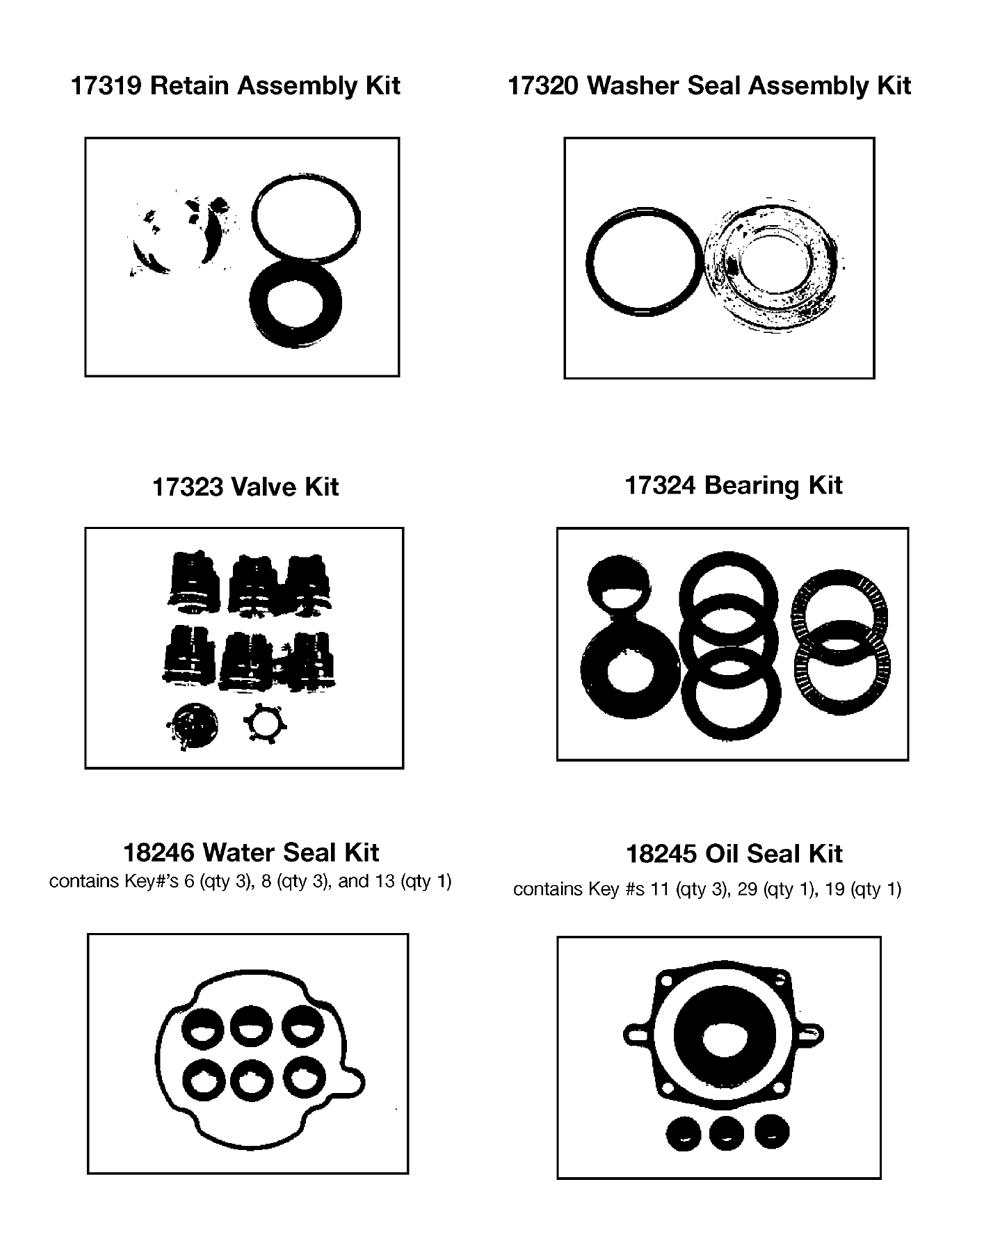 WGCH2225-Devilbiss-T0-PB-1Break Down